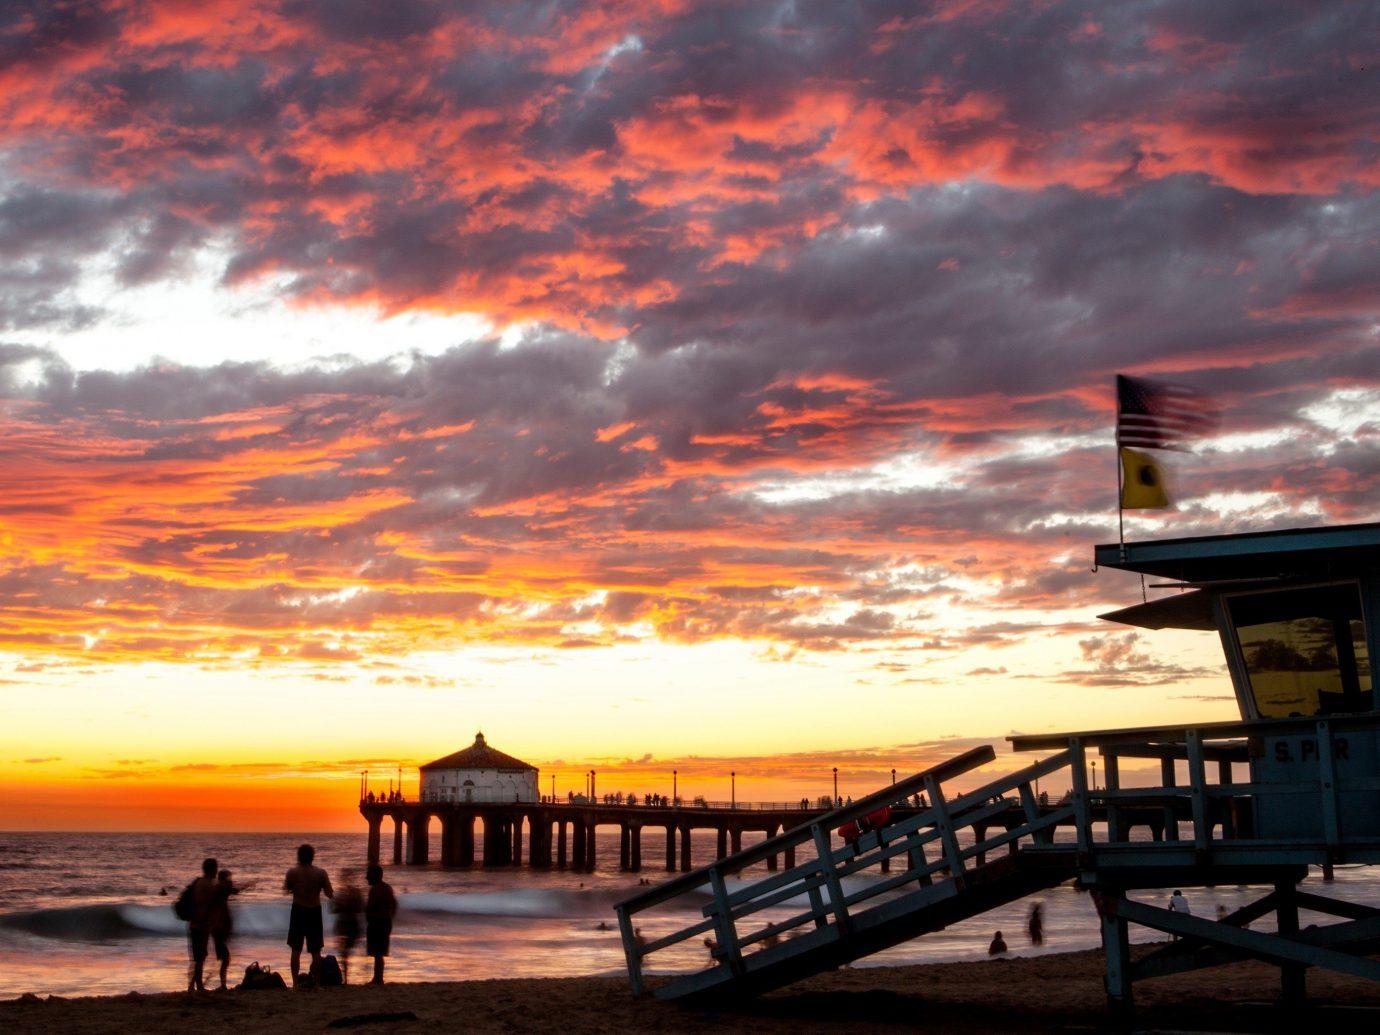 Trip Ideas outdoor sky water Sunset afterglow scene cloud pier horizon sunrise evening dusk dawn morning Sea Ocean Coast Beach setting clouds cloudy